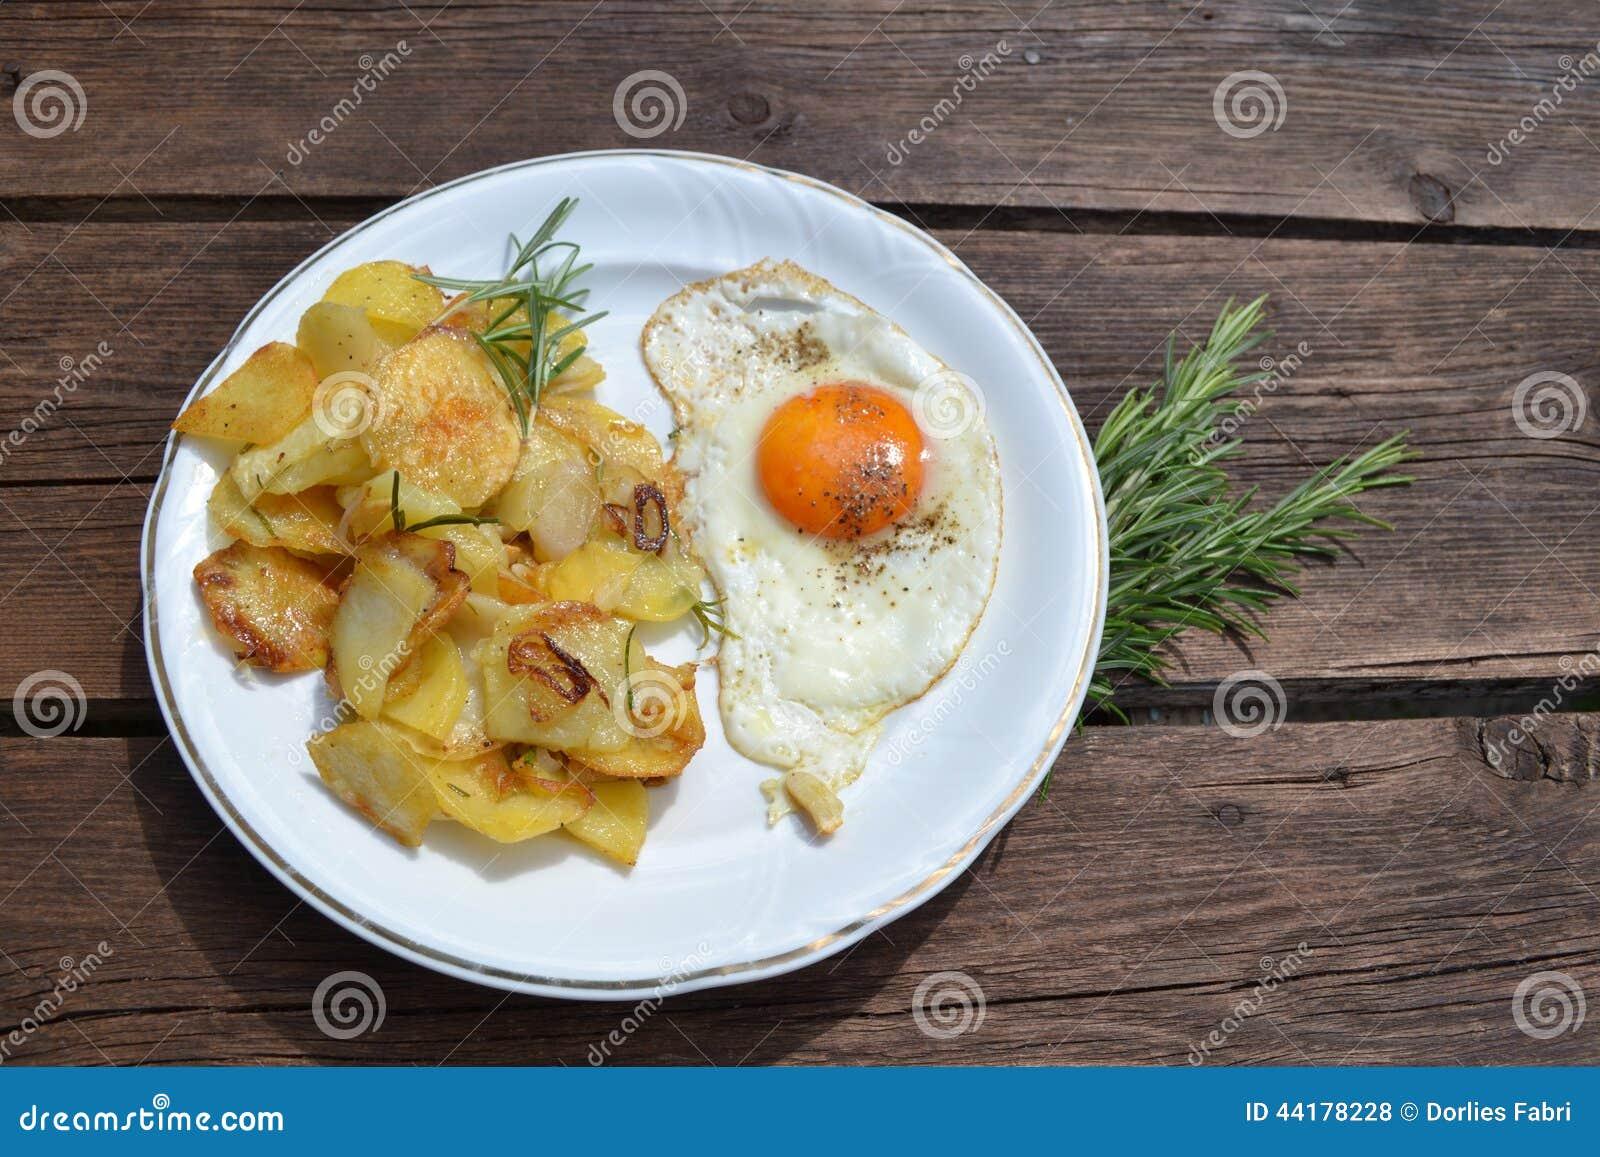 oeuf au plat avec les pommes de terre frites photo stock image du potatoes romarin 44178228. Black Bedroom Furniture Sets. Home Design Ideas